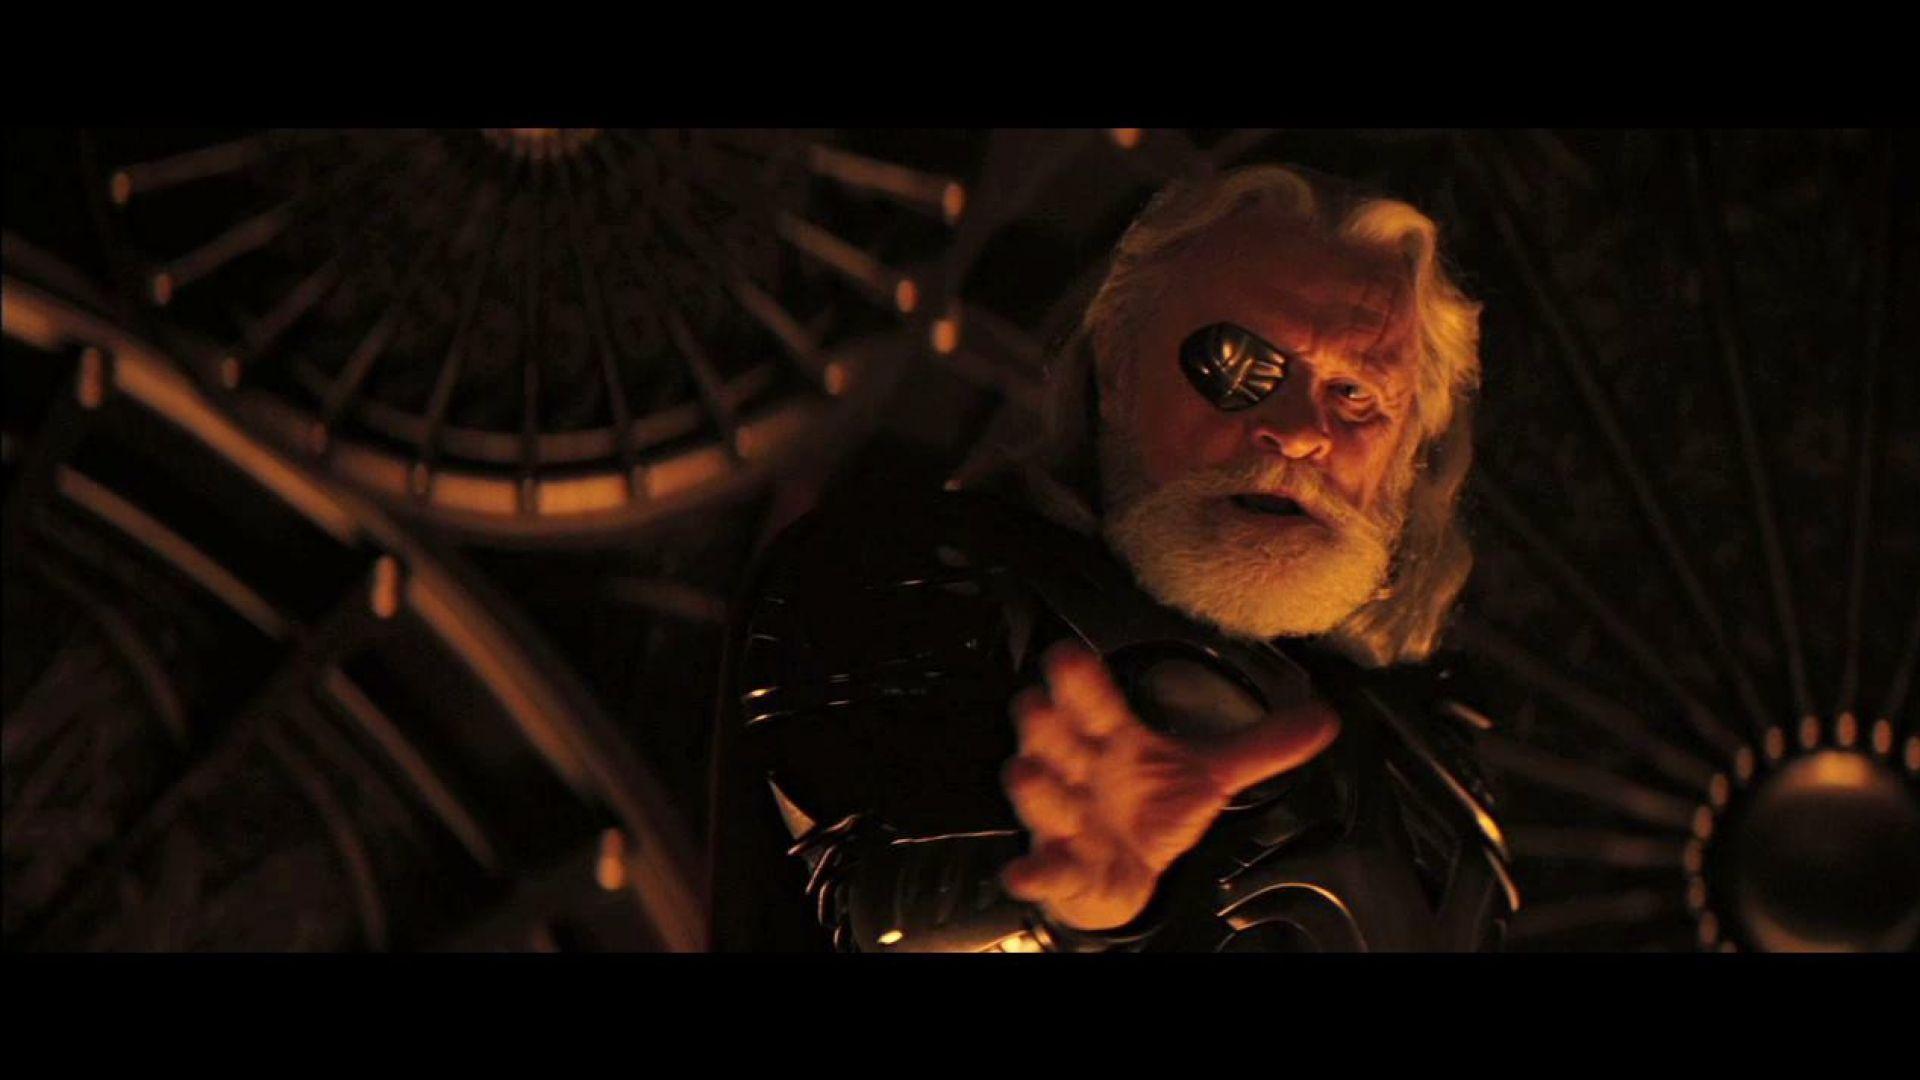 Odin tells Thor he's unworthy